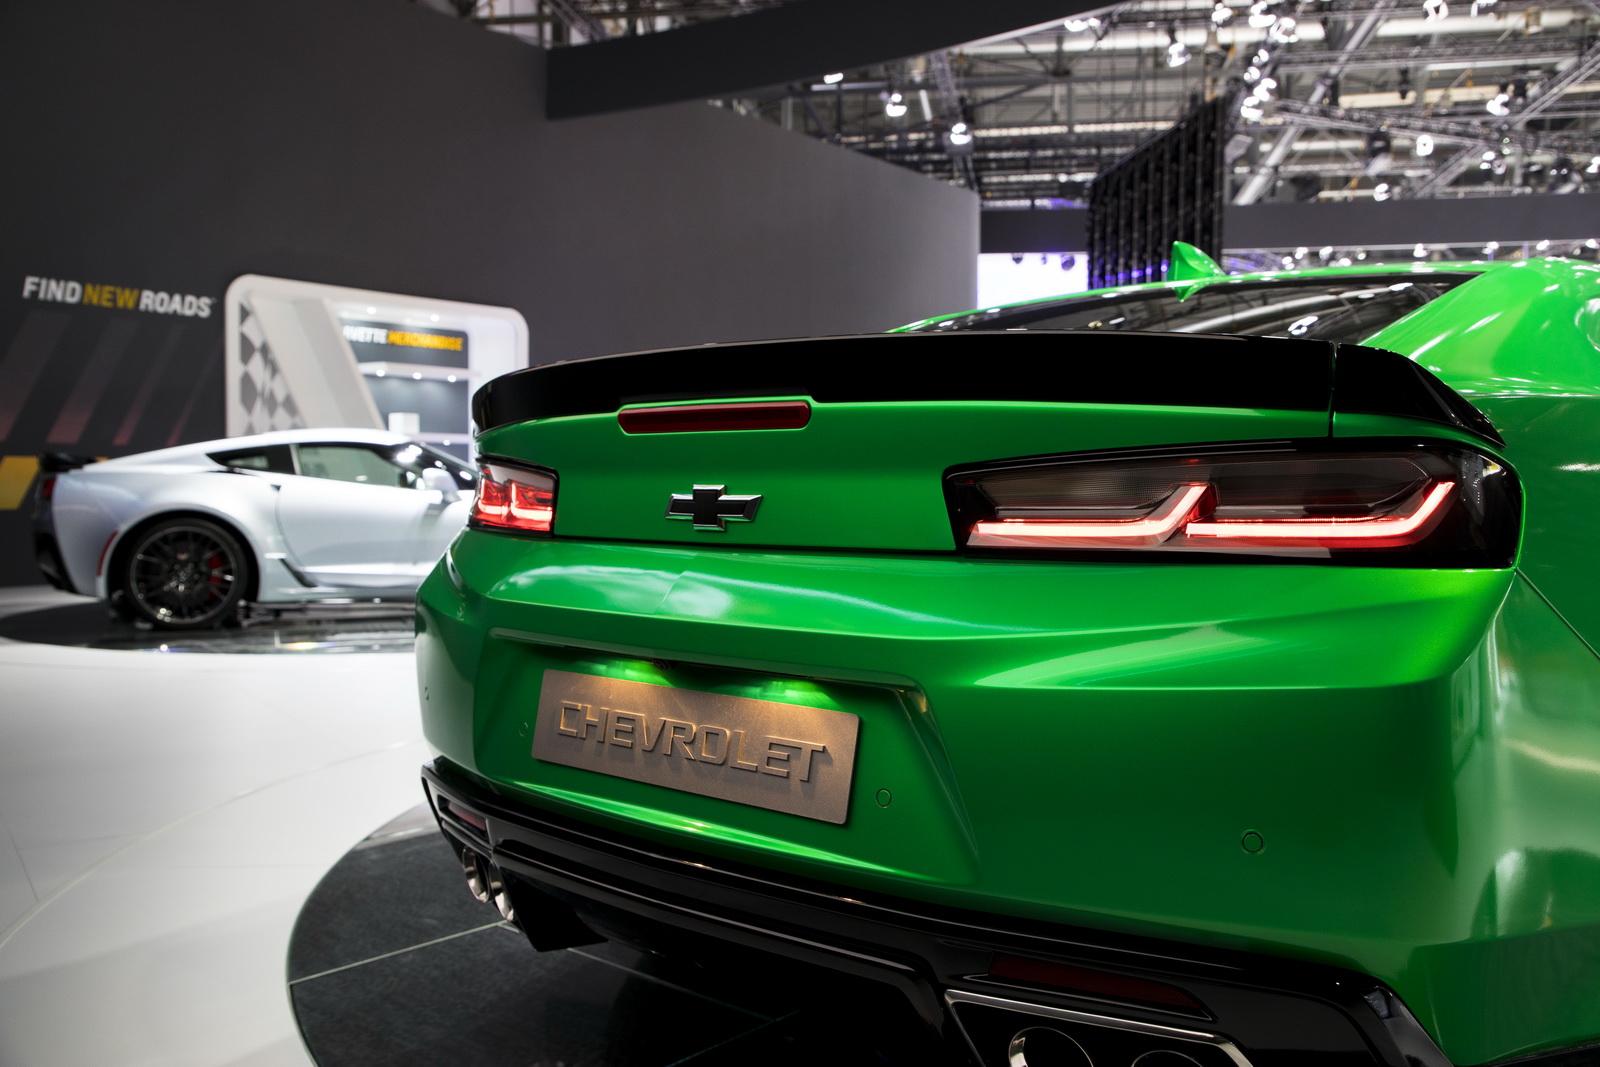 Chevrolet Camaro Track Concept (7)